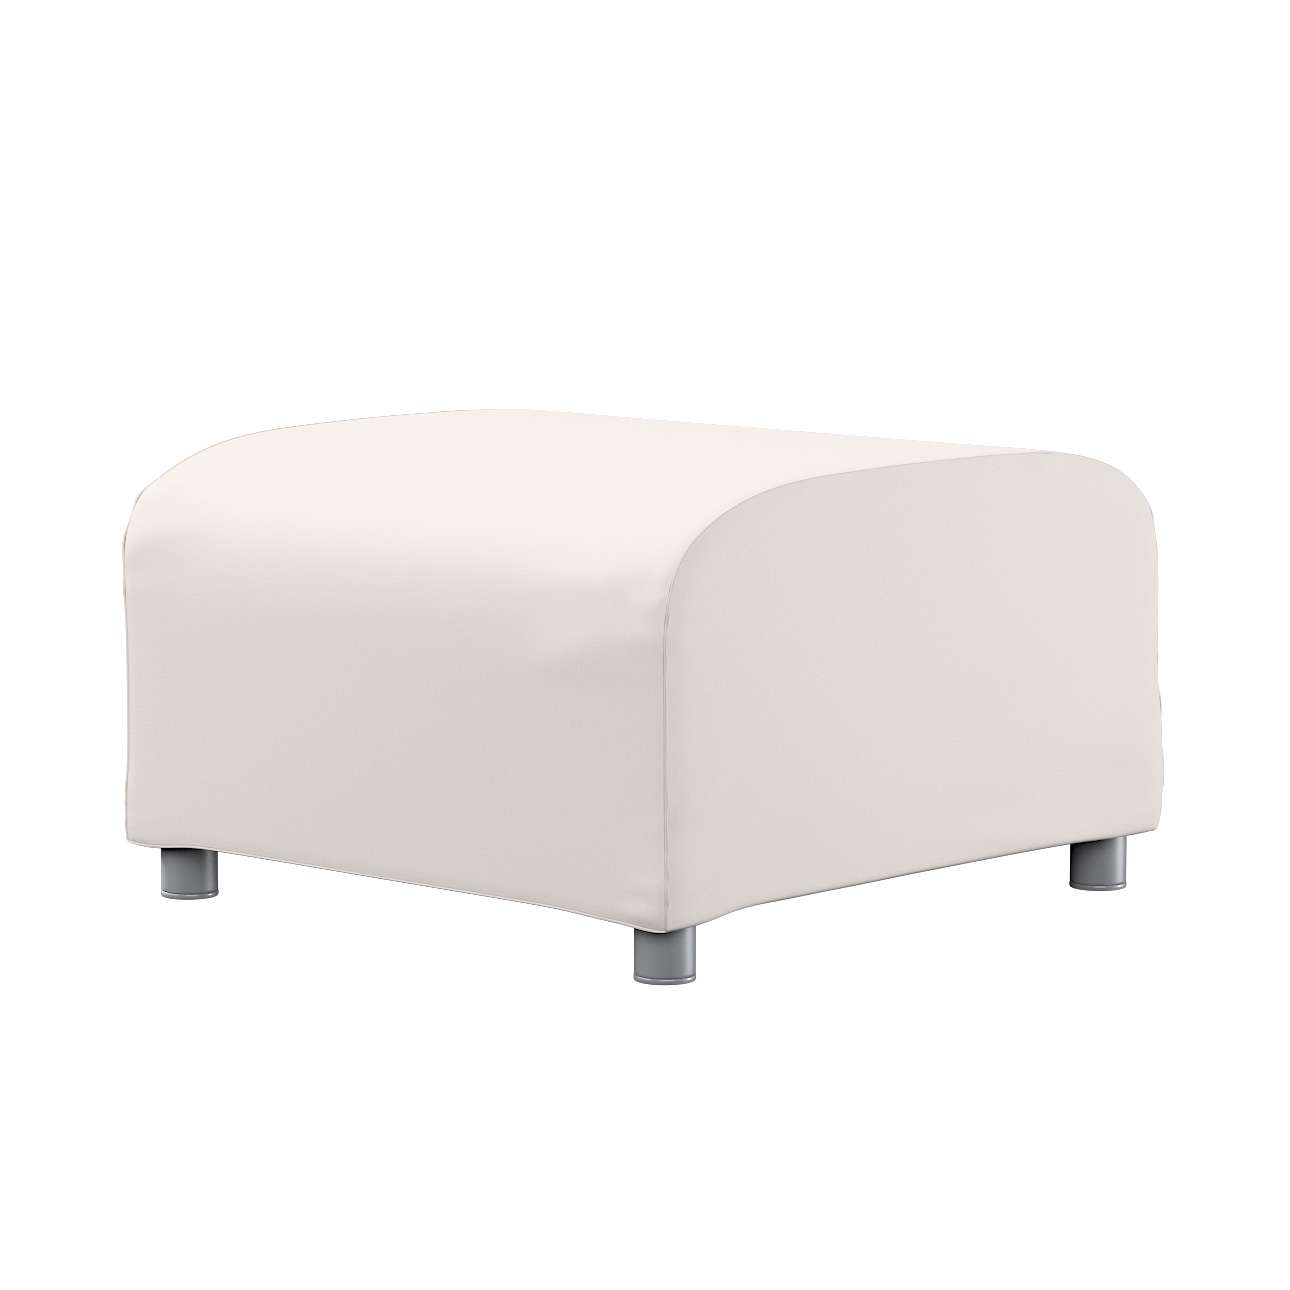 KLIPPAN pufo užvalkalas Klippan footstool cover kolekcijoje Etna , audinys: 705-01